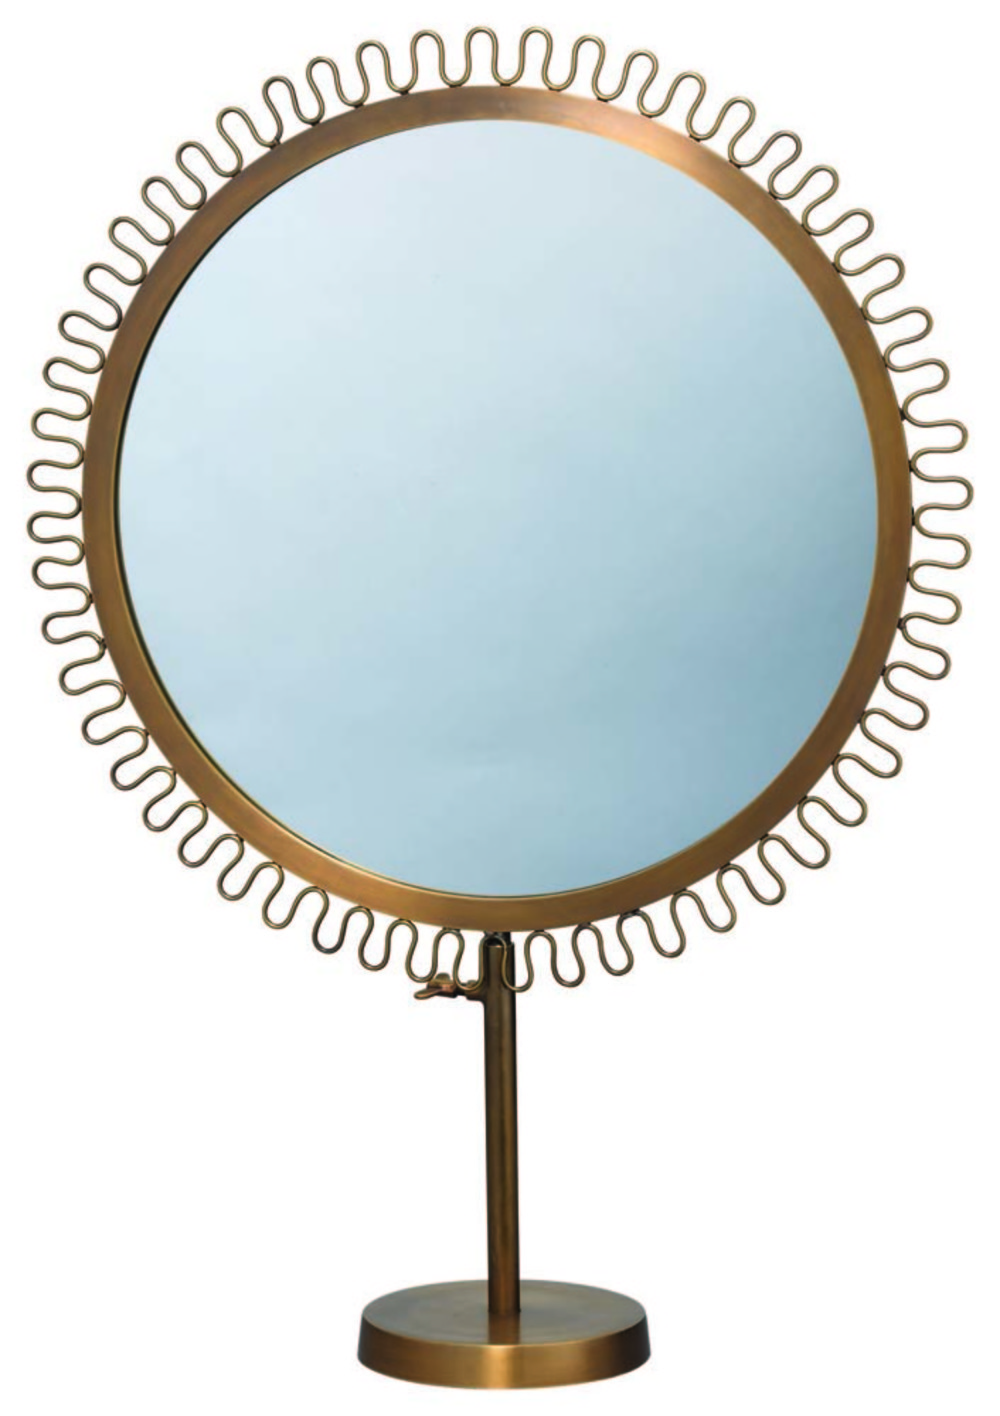 Jamie Young - Sunburst Standing Mirror